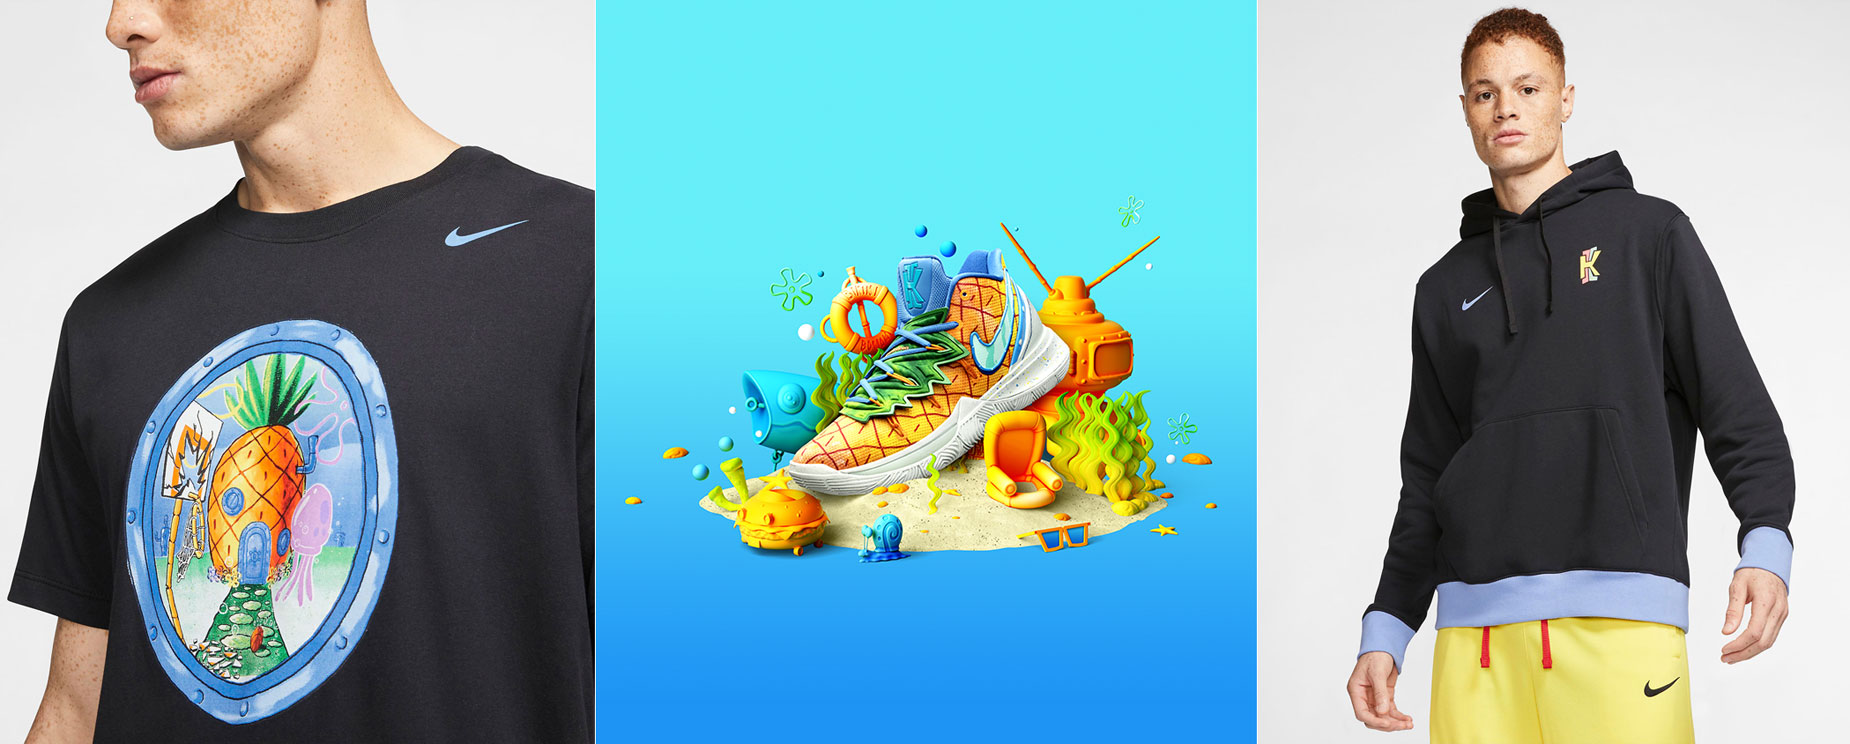 spongebob-nike-kyrie-5-pineapple-house-clothing-match